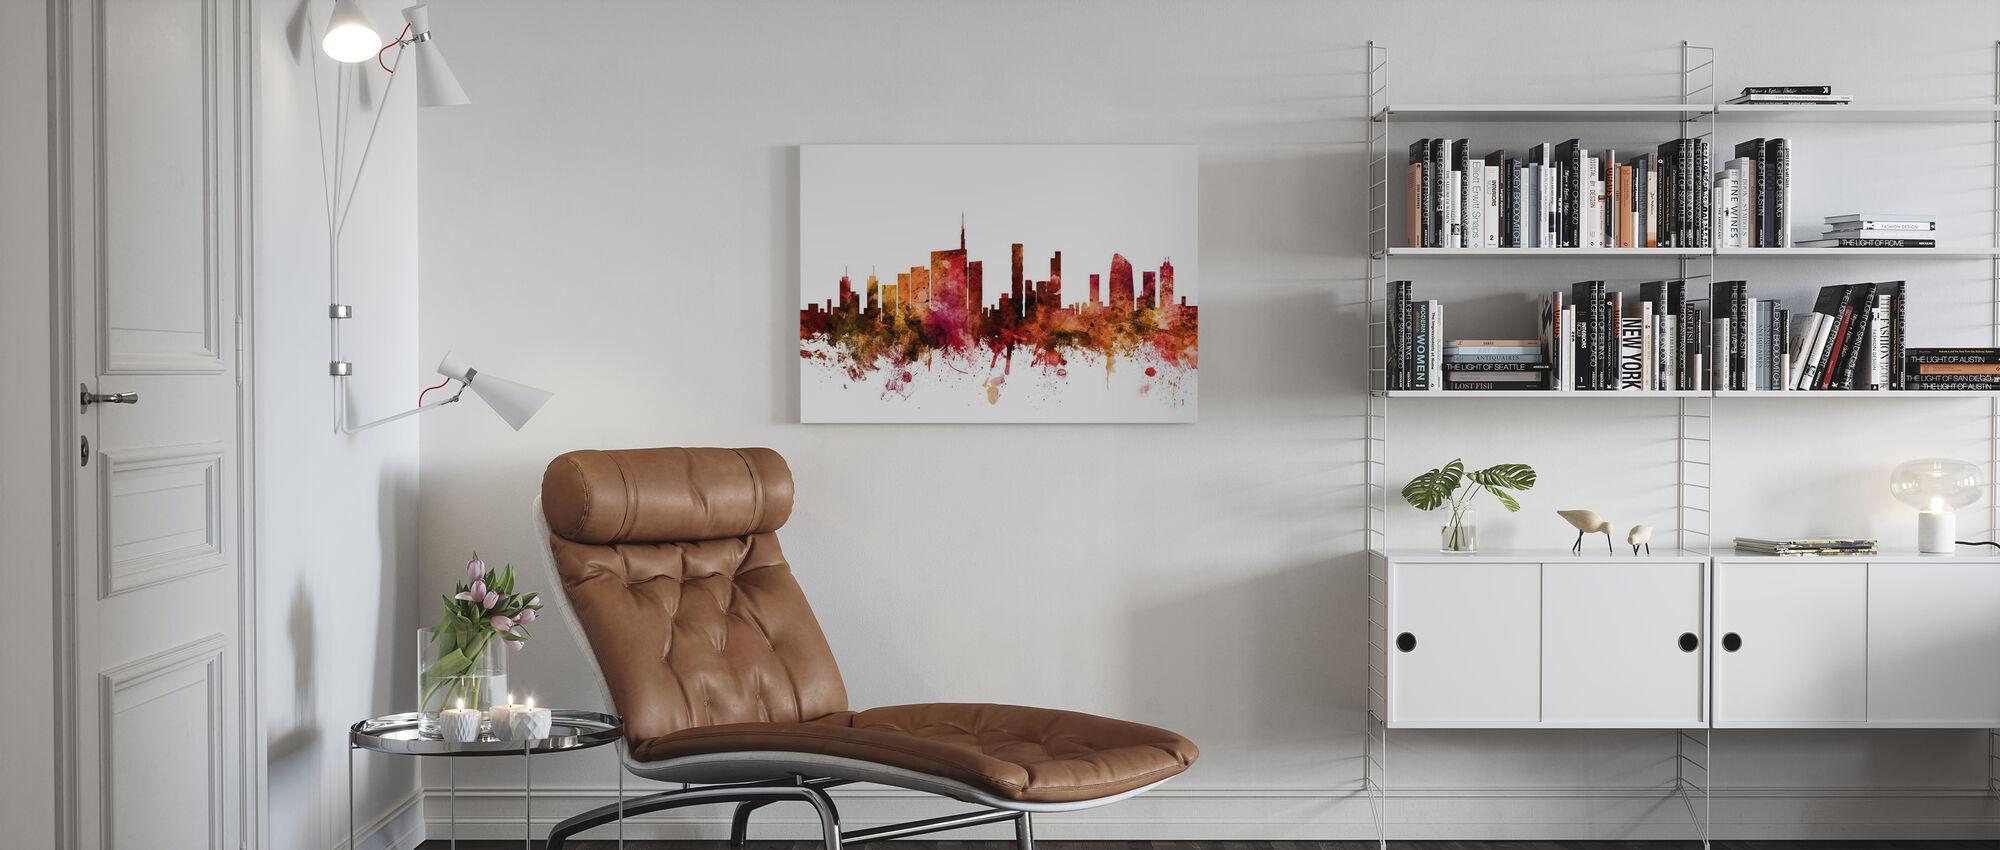 Milan Italy Skyline - Canvas print - Living Room